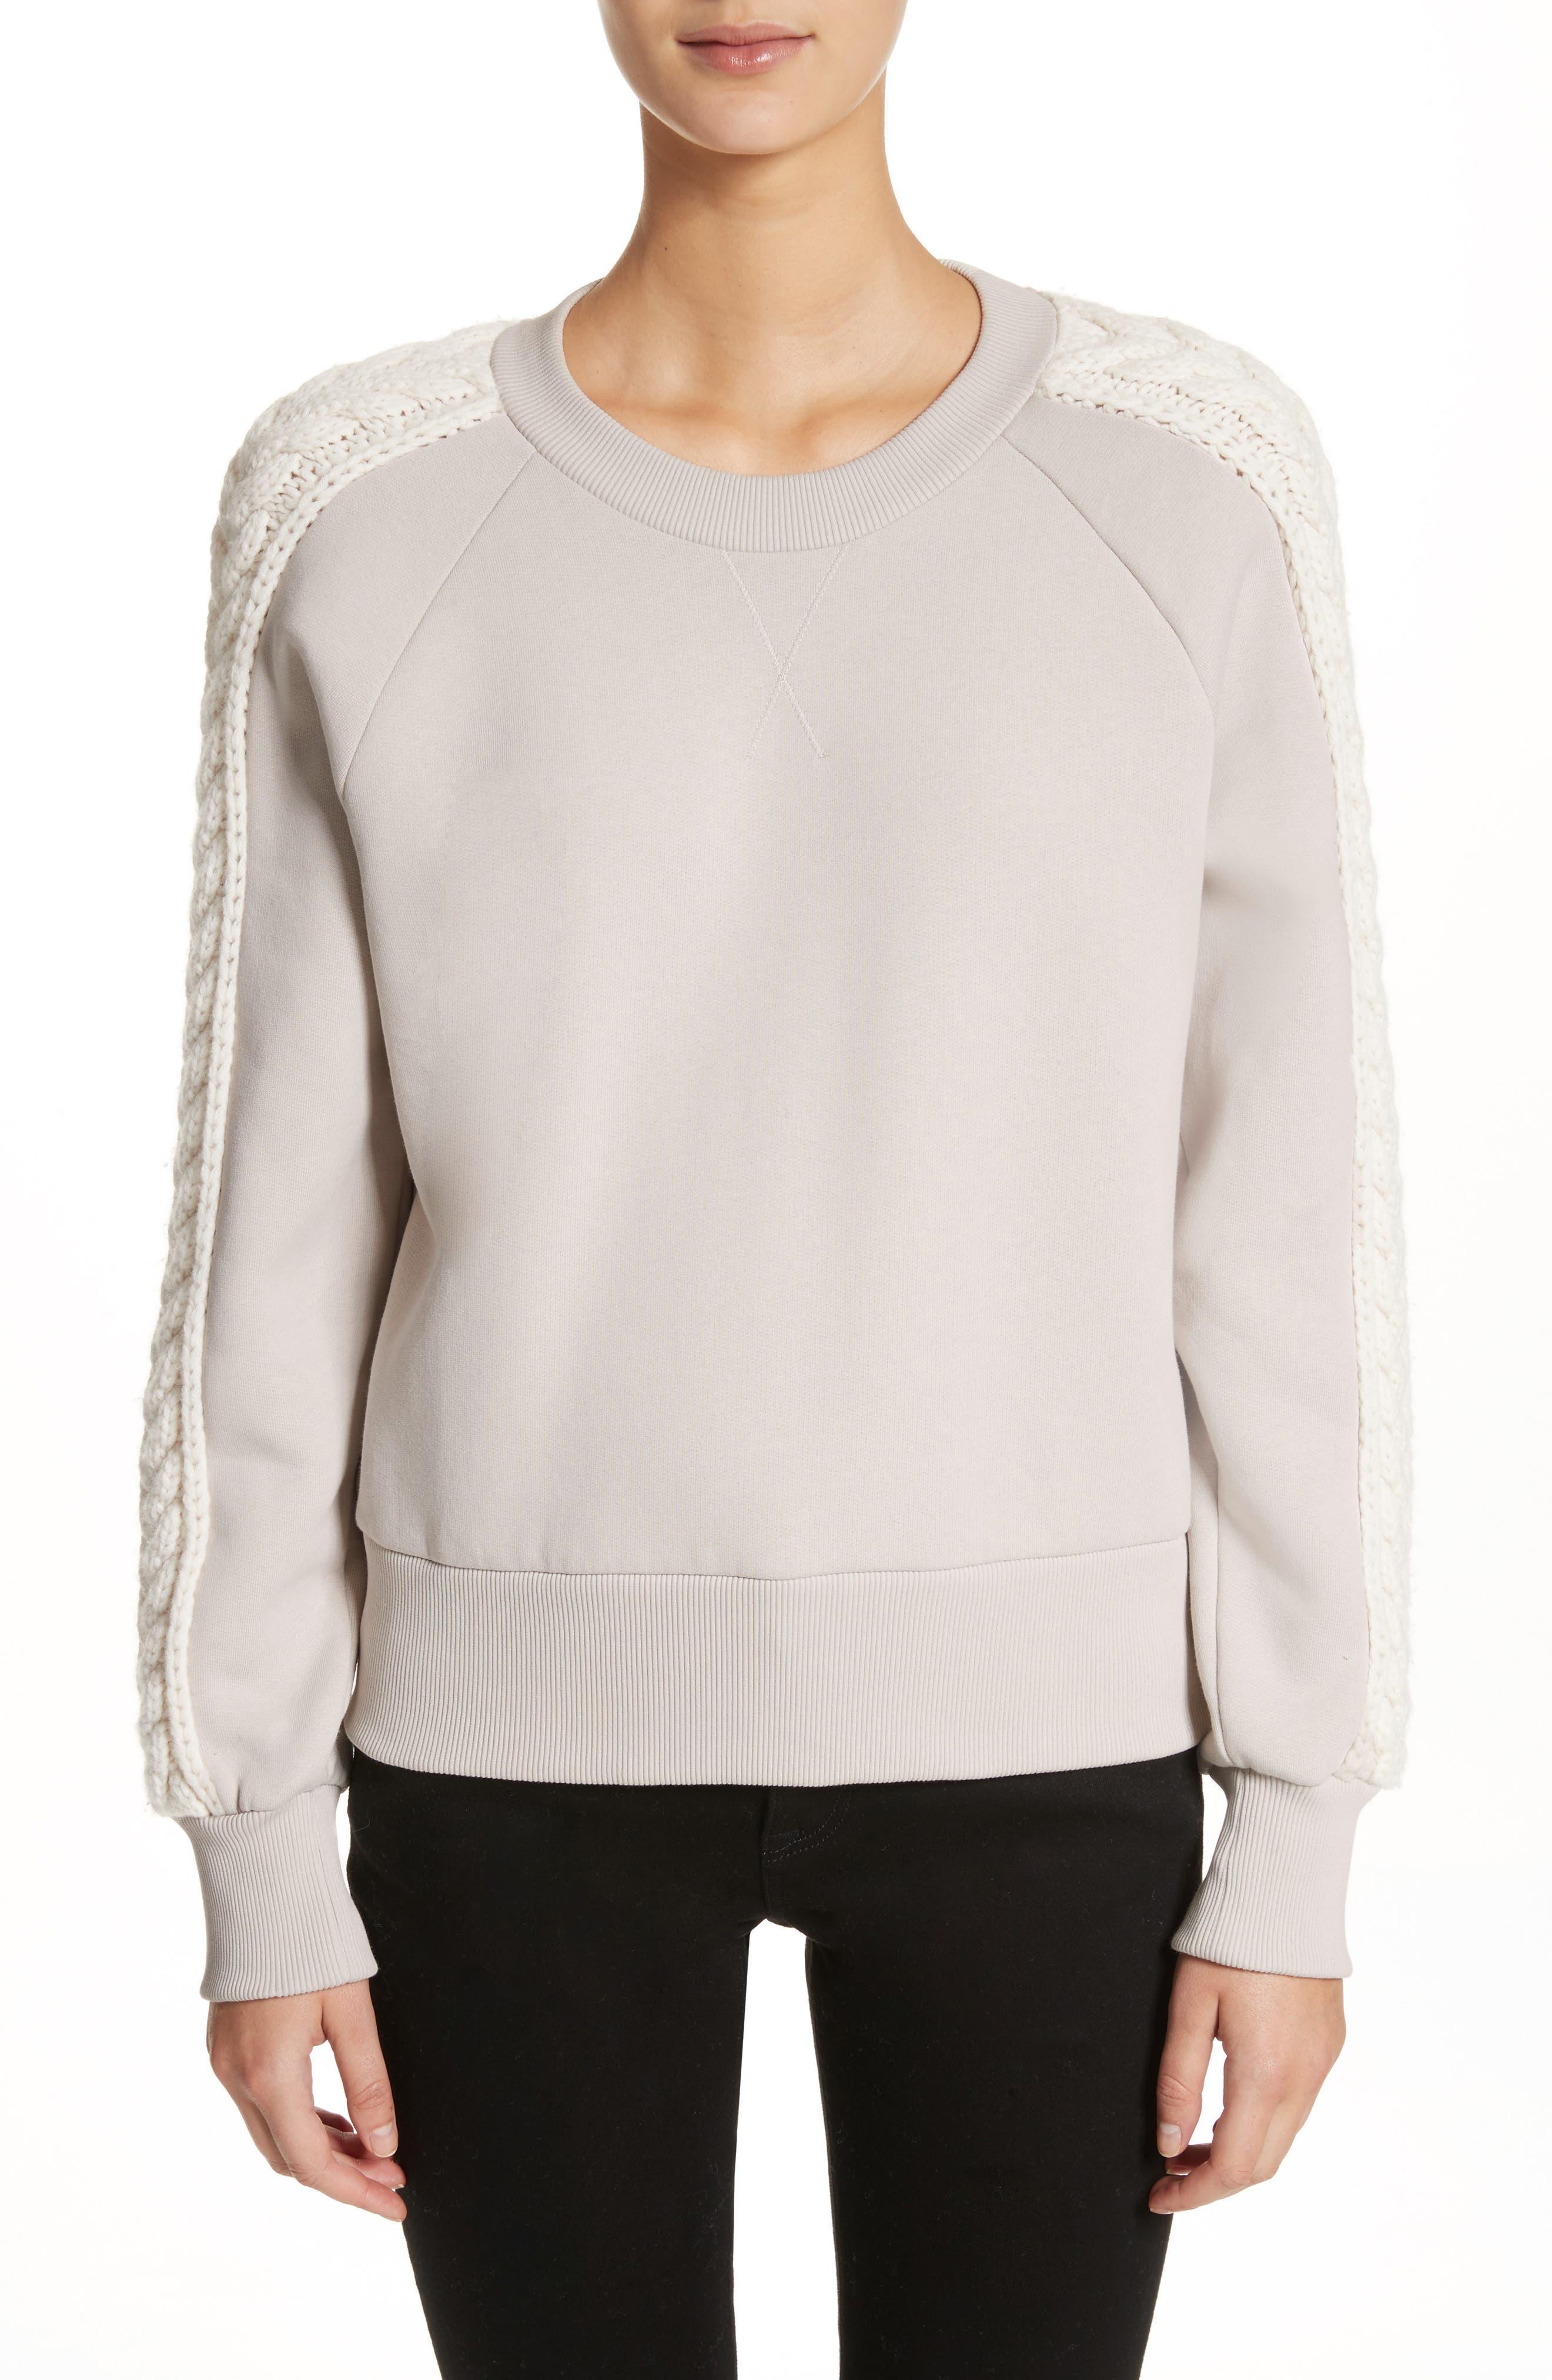 Selho Sweatshirt,                         Main,                         color, 106